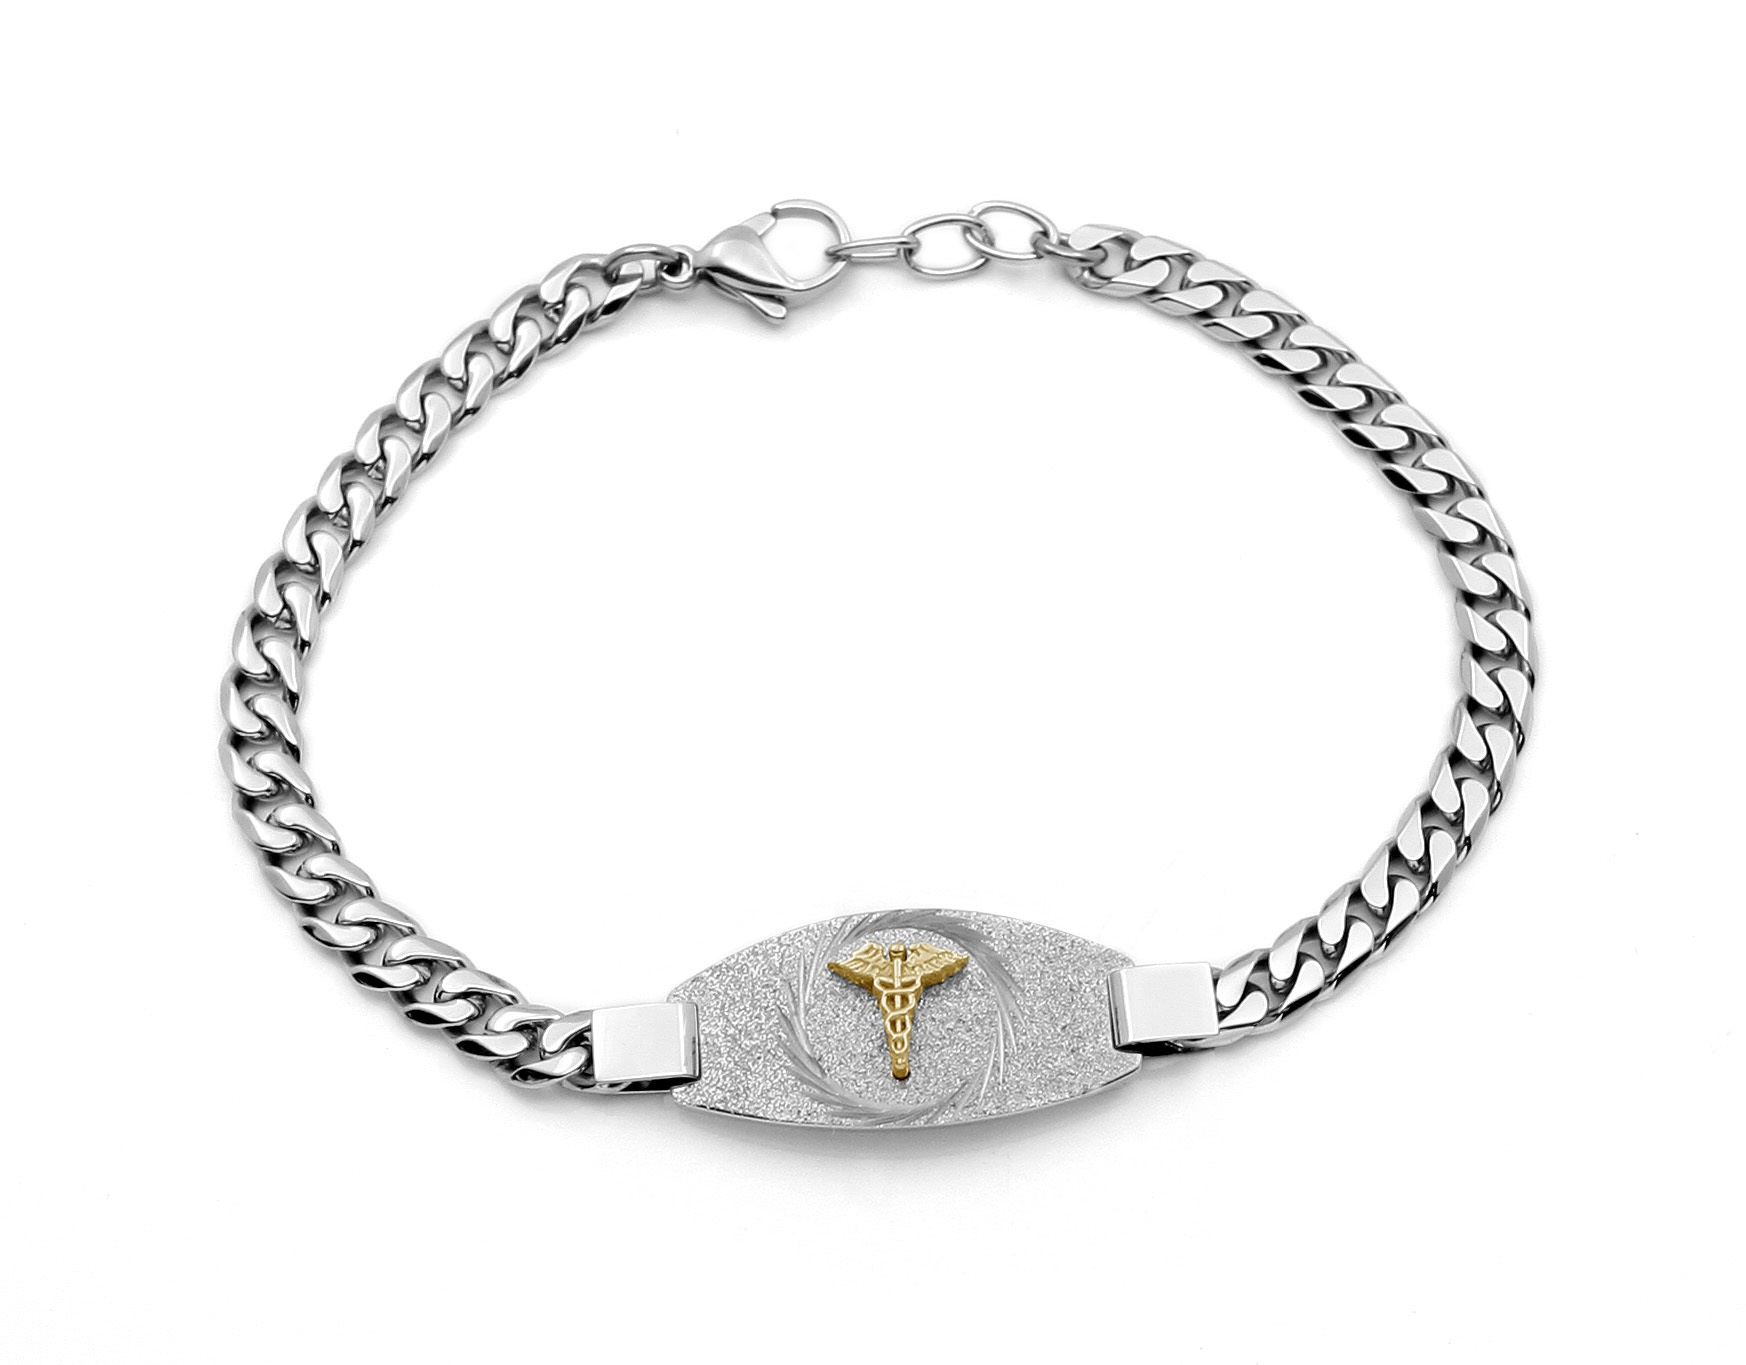 Medical bracelet - 2-tone stainless steel